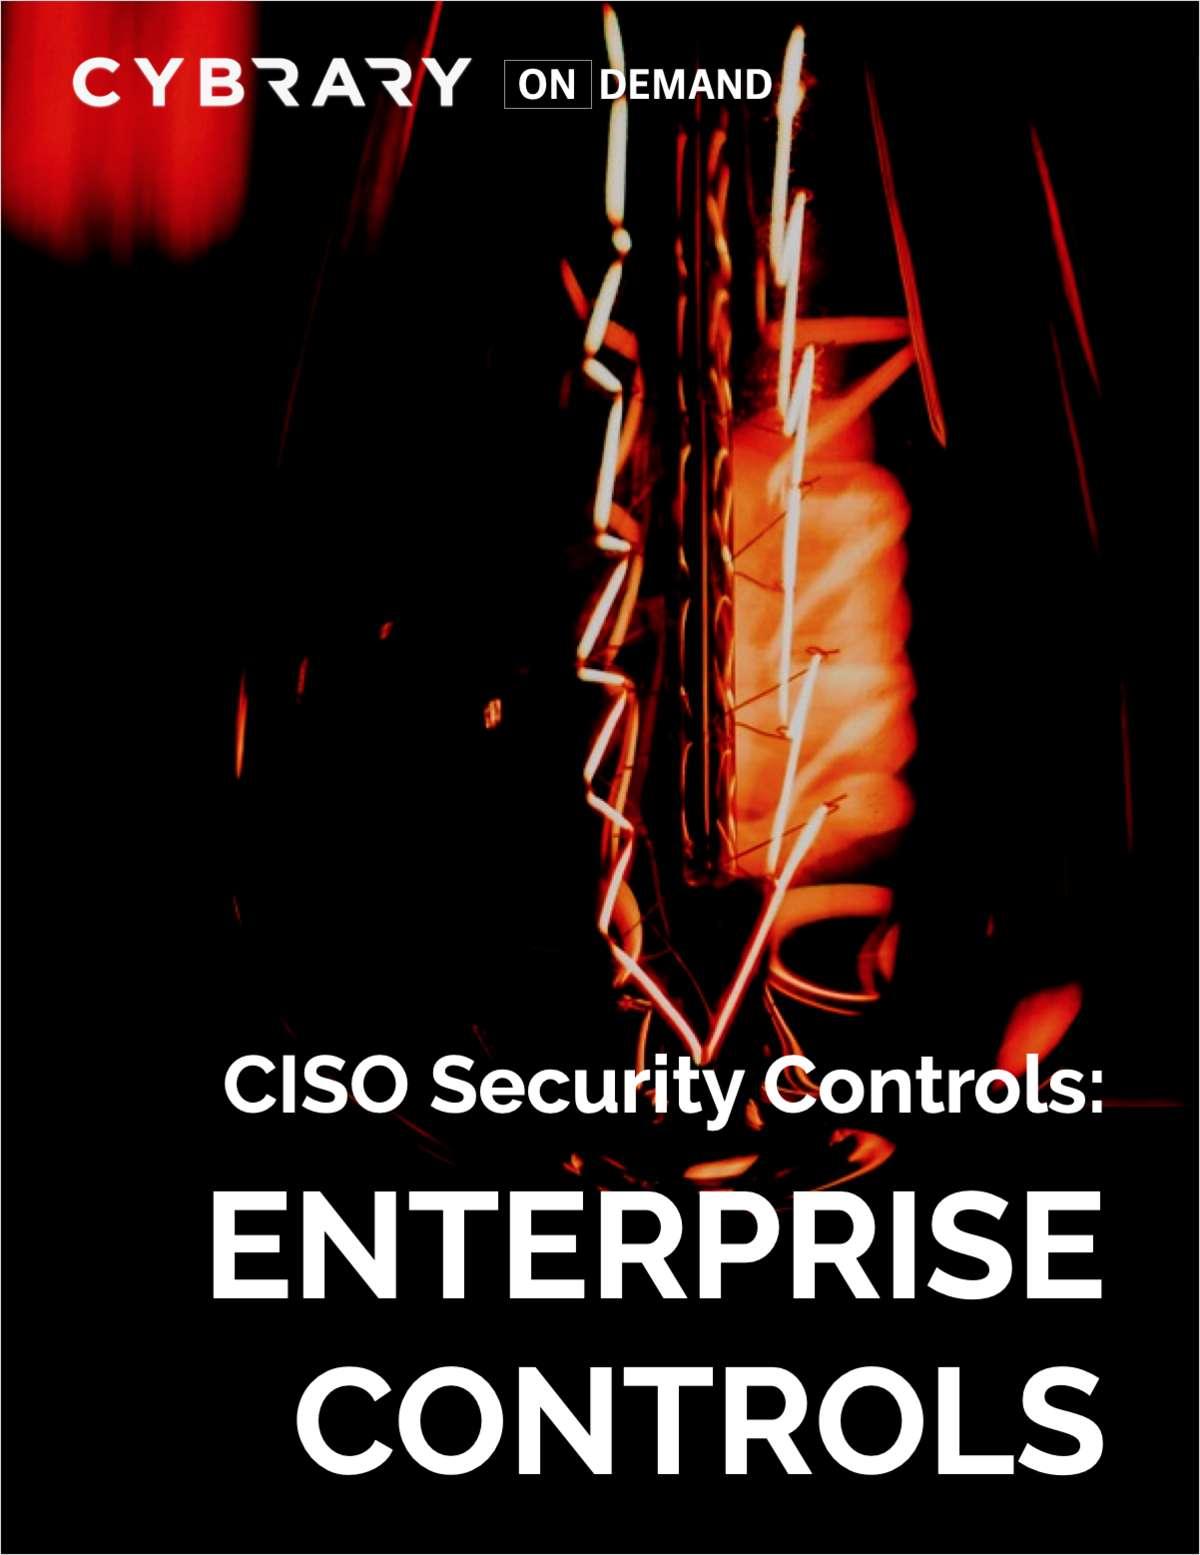 CISO Security Controls: Enterprise Controls